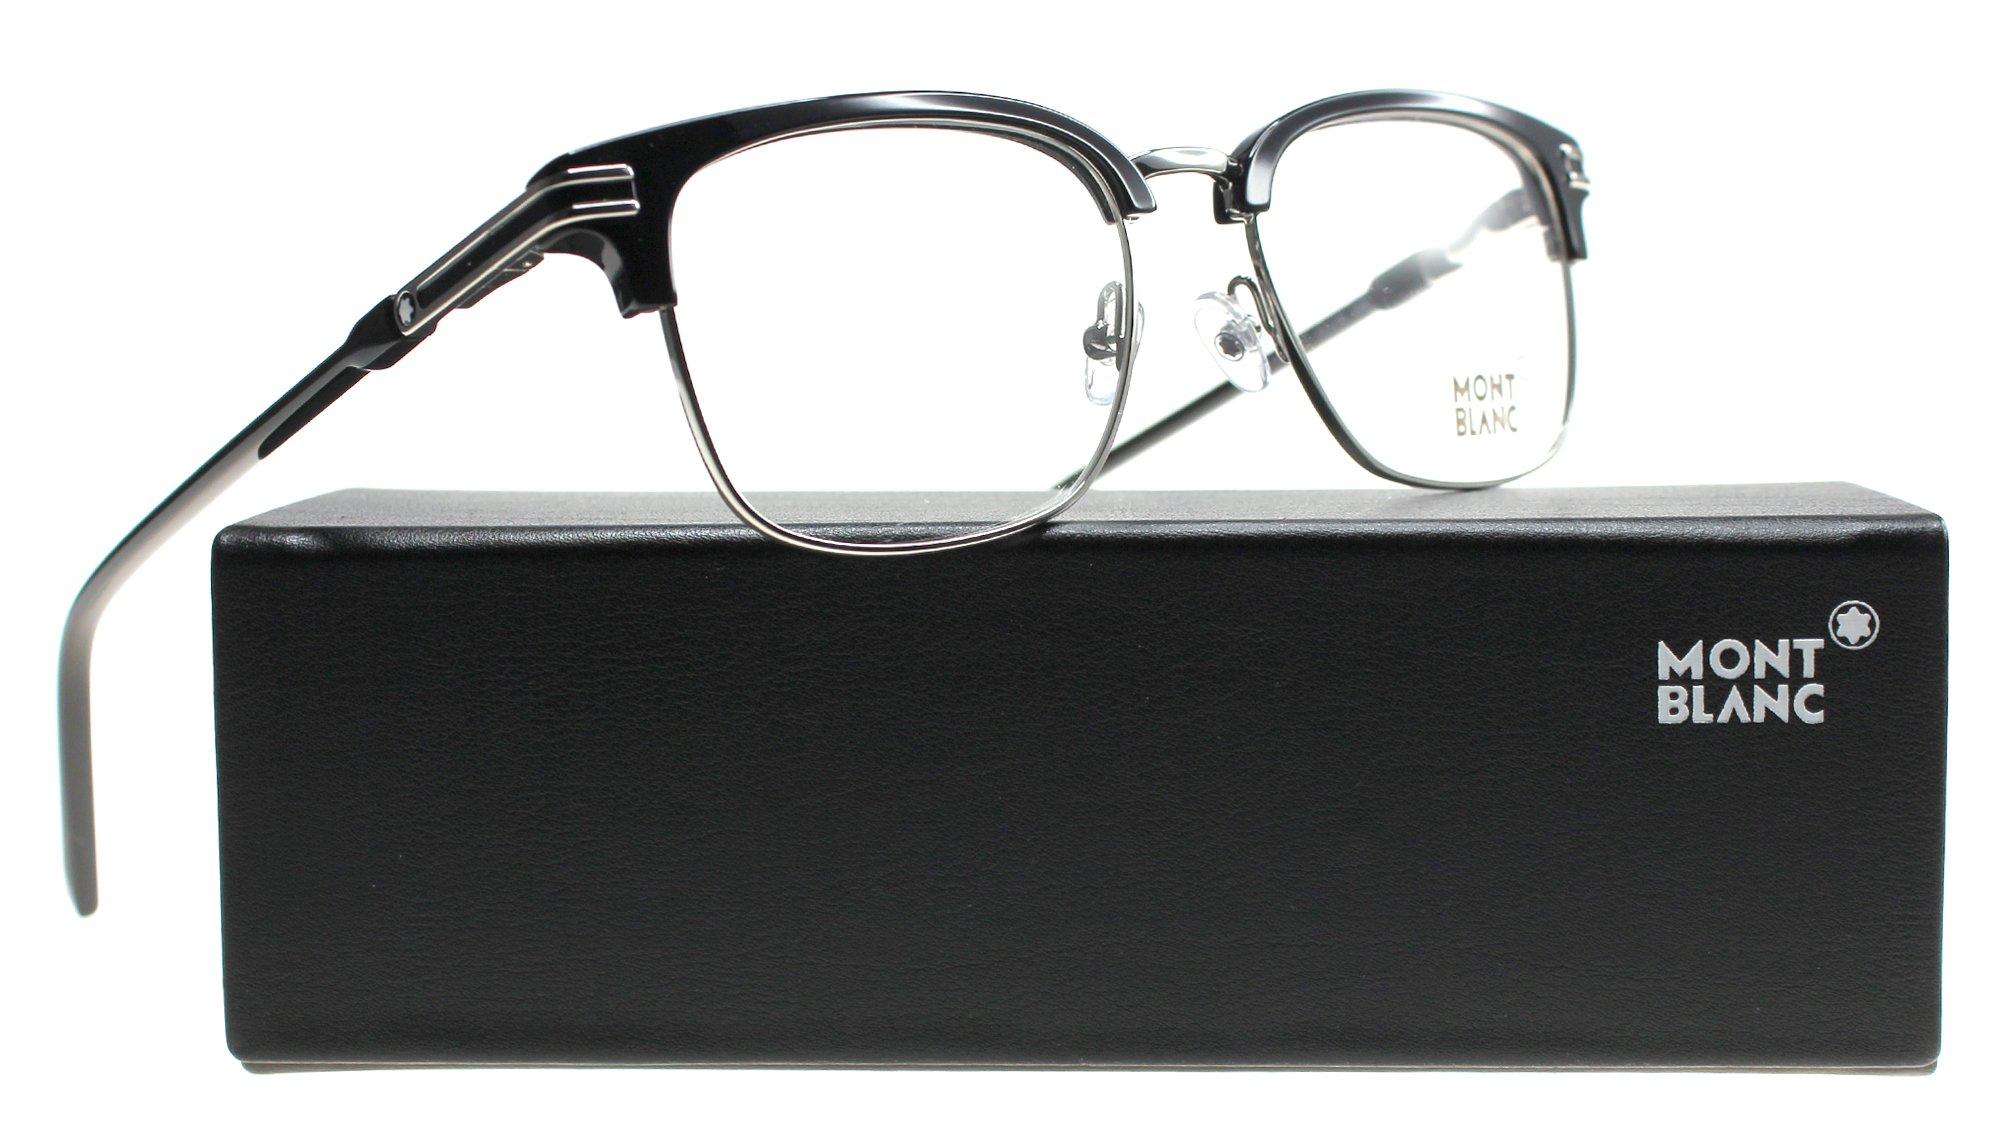 Eyeglasses Montblanc MB 669 MB 0669 001 shiny black by MONTBLANC